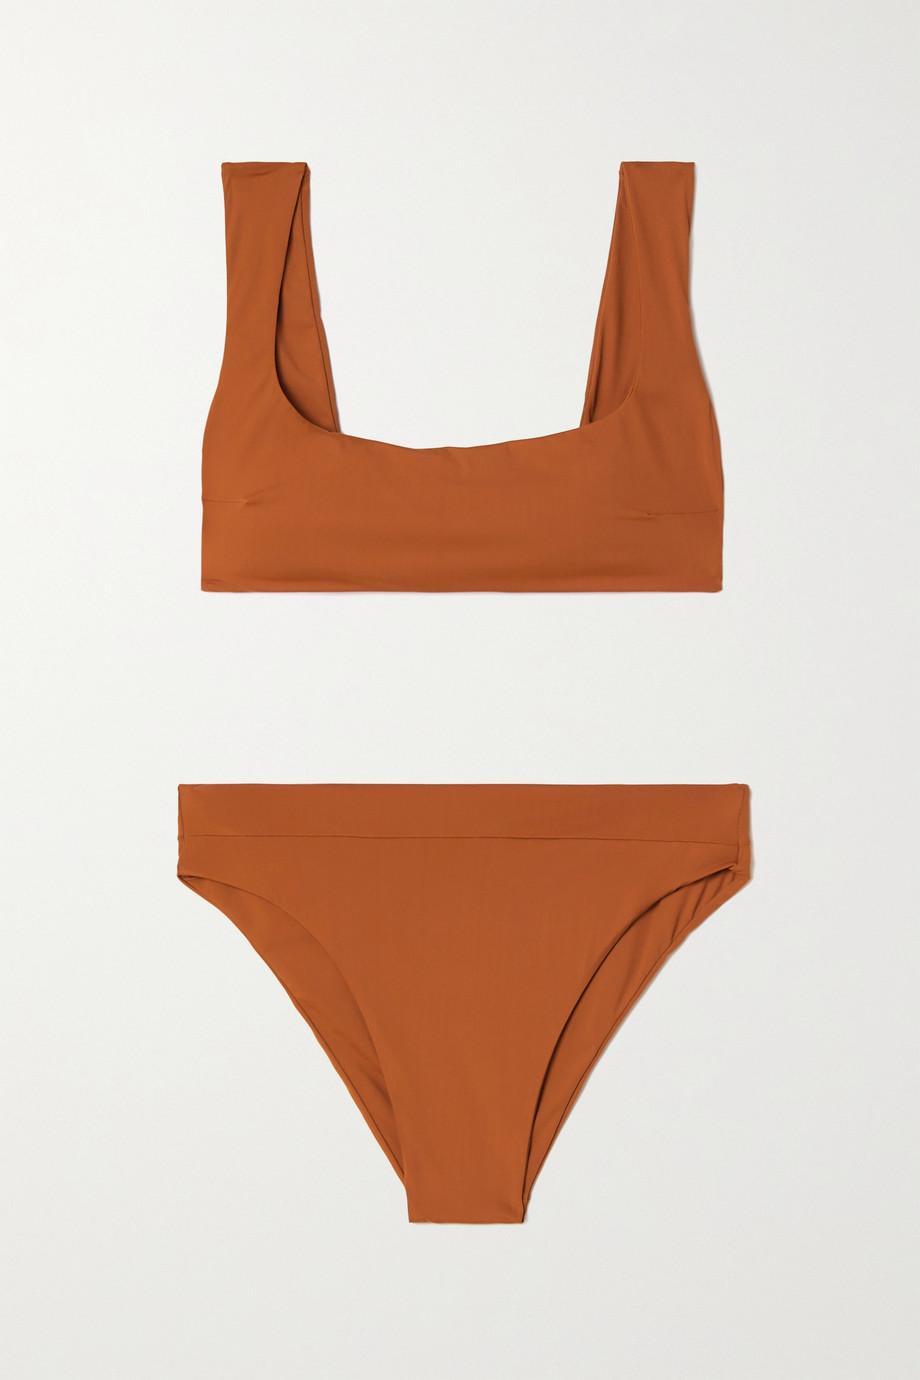 Haight Brigitte bikini